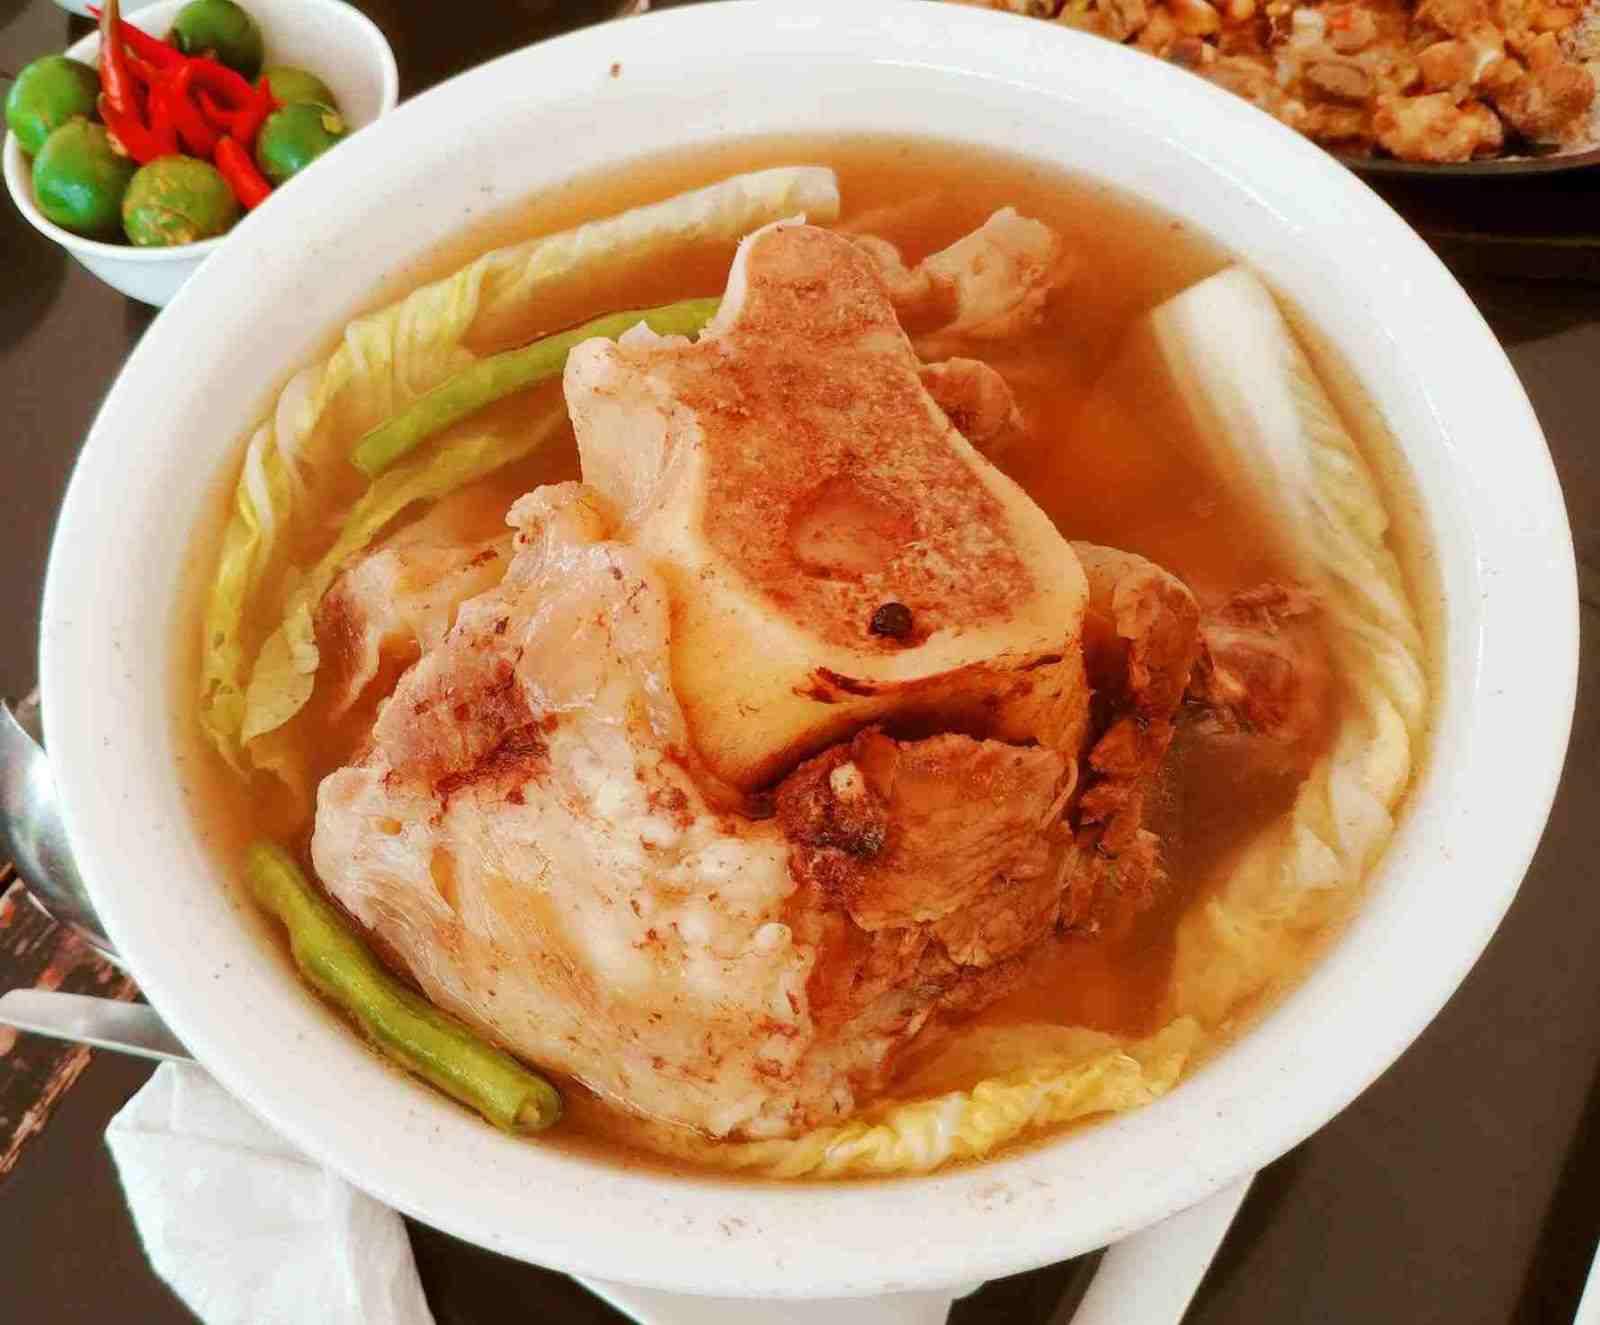 Mer-Ben Tapsilogan's bulalo soup